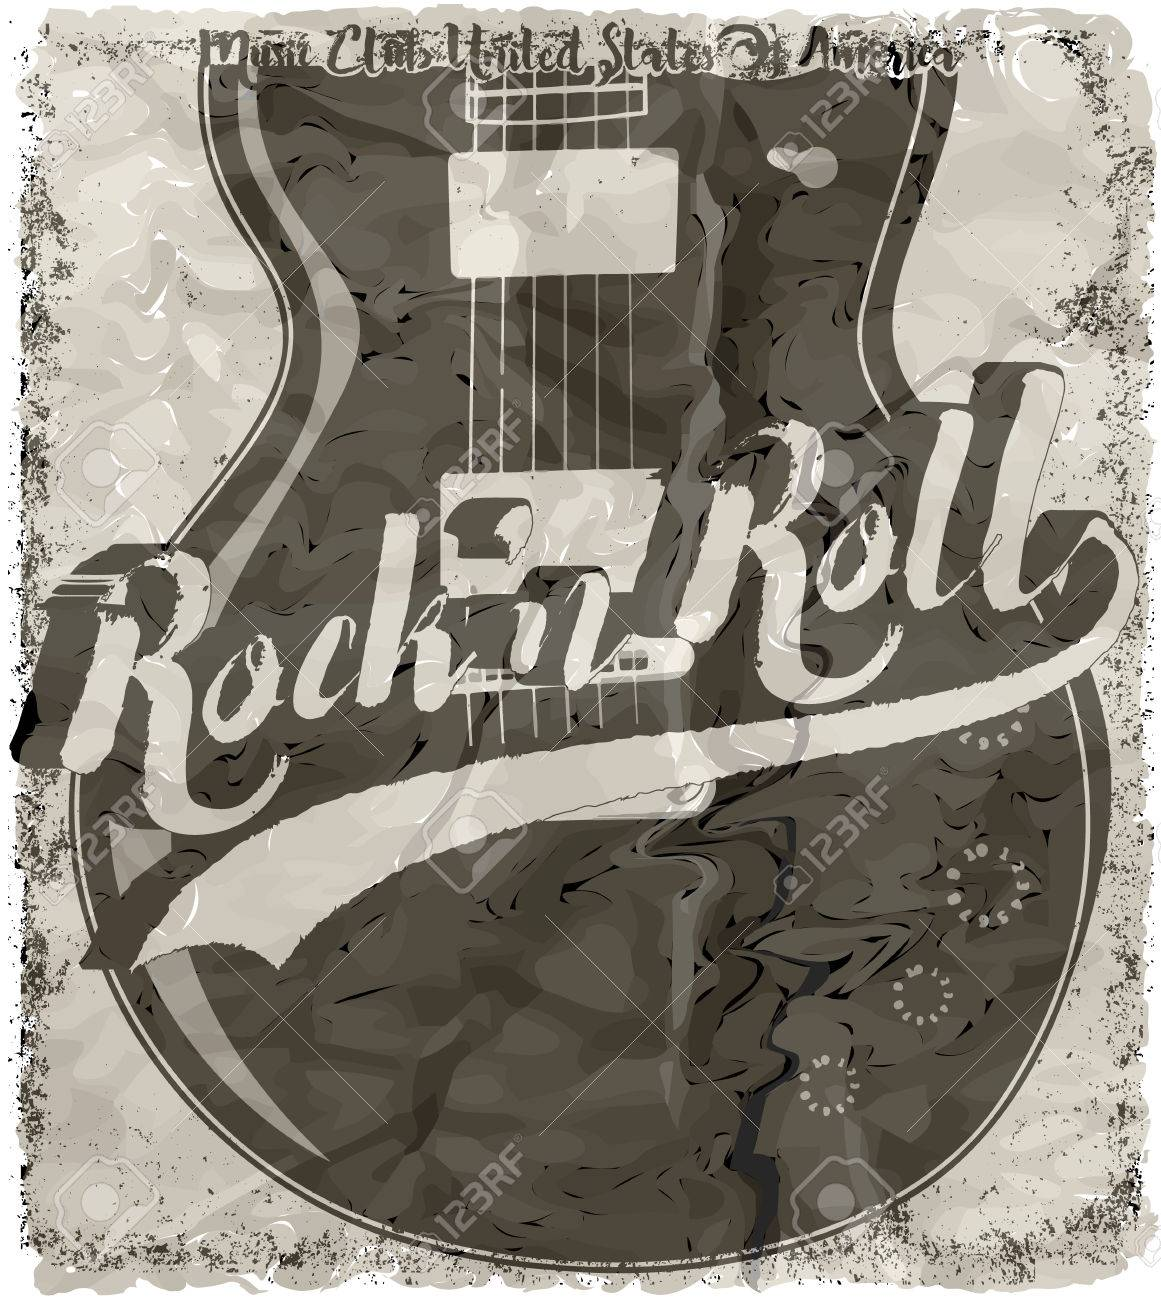 Rock n roll poster design - Rock N Roll Poster Guitar Graphic Design Tee Vector Art Stock Vector 56721344